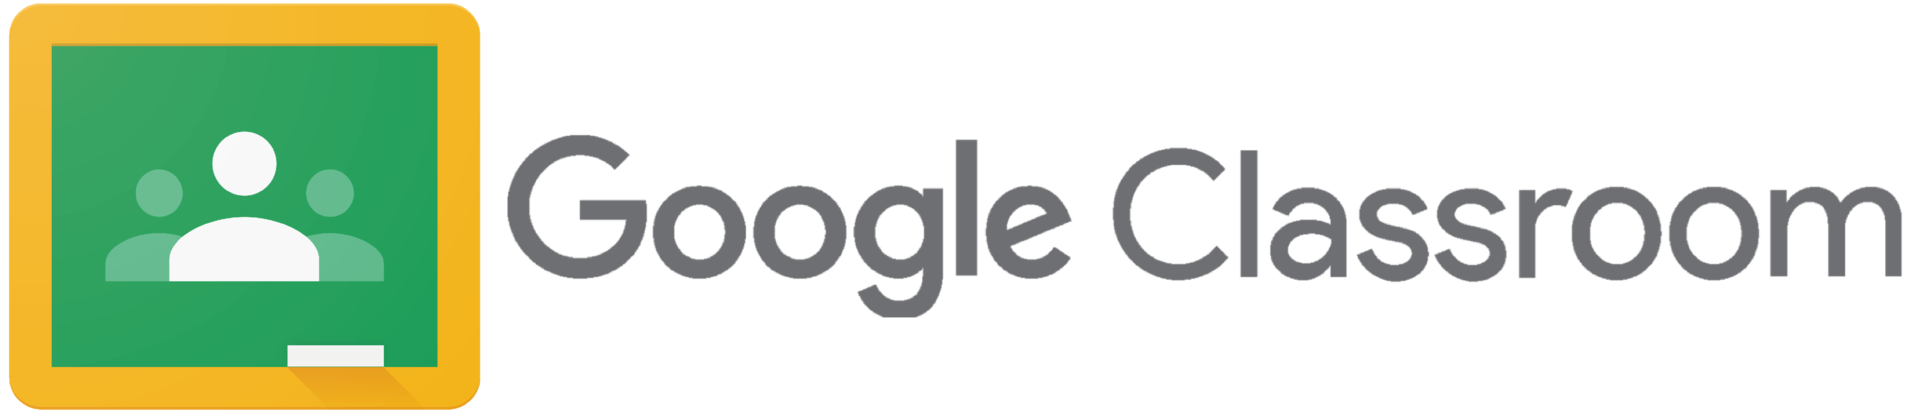 Google Classroom EOI La Seu